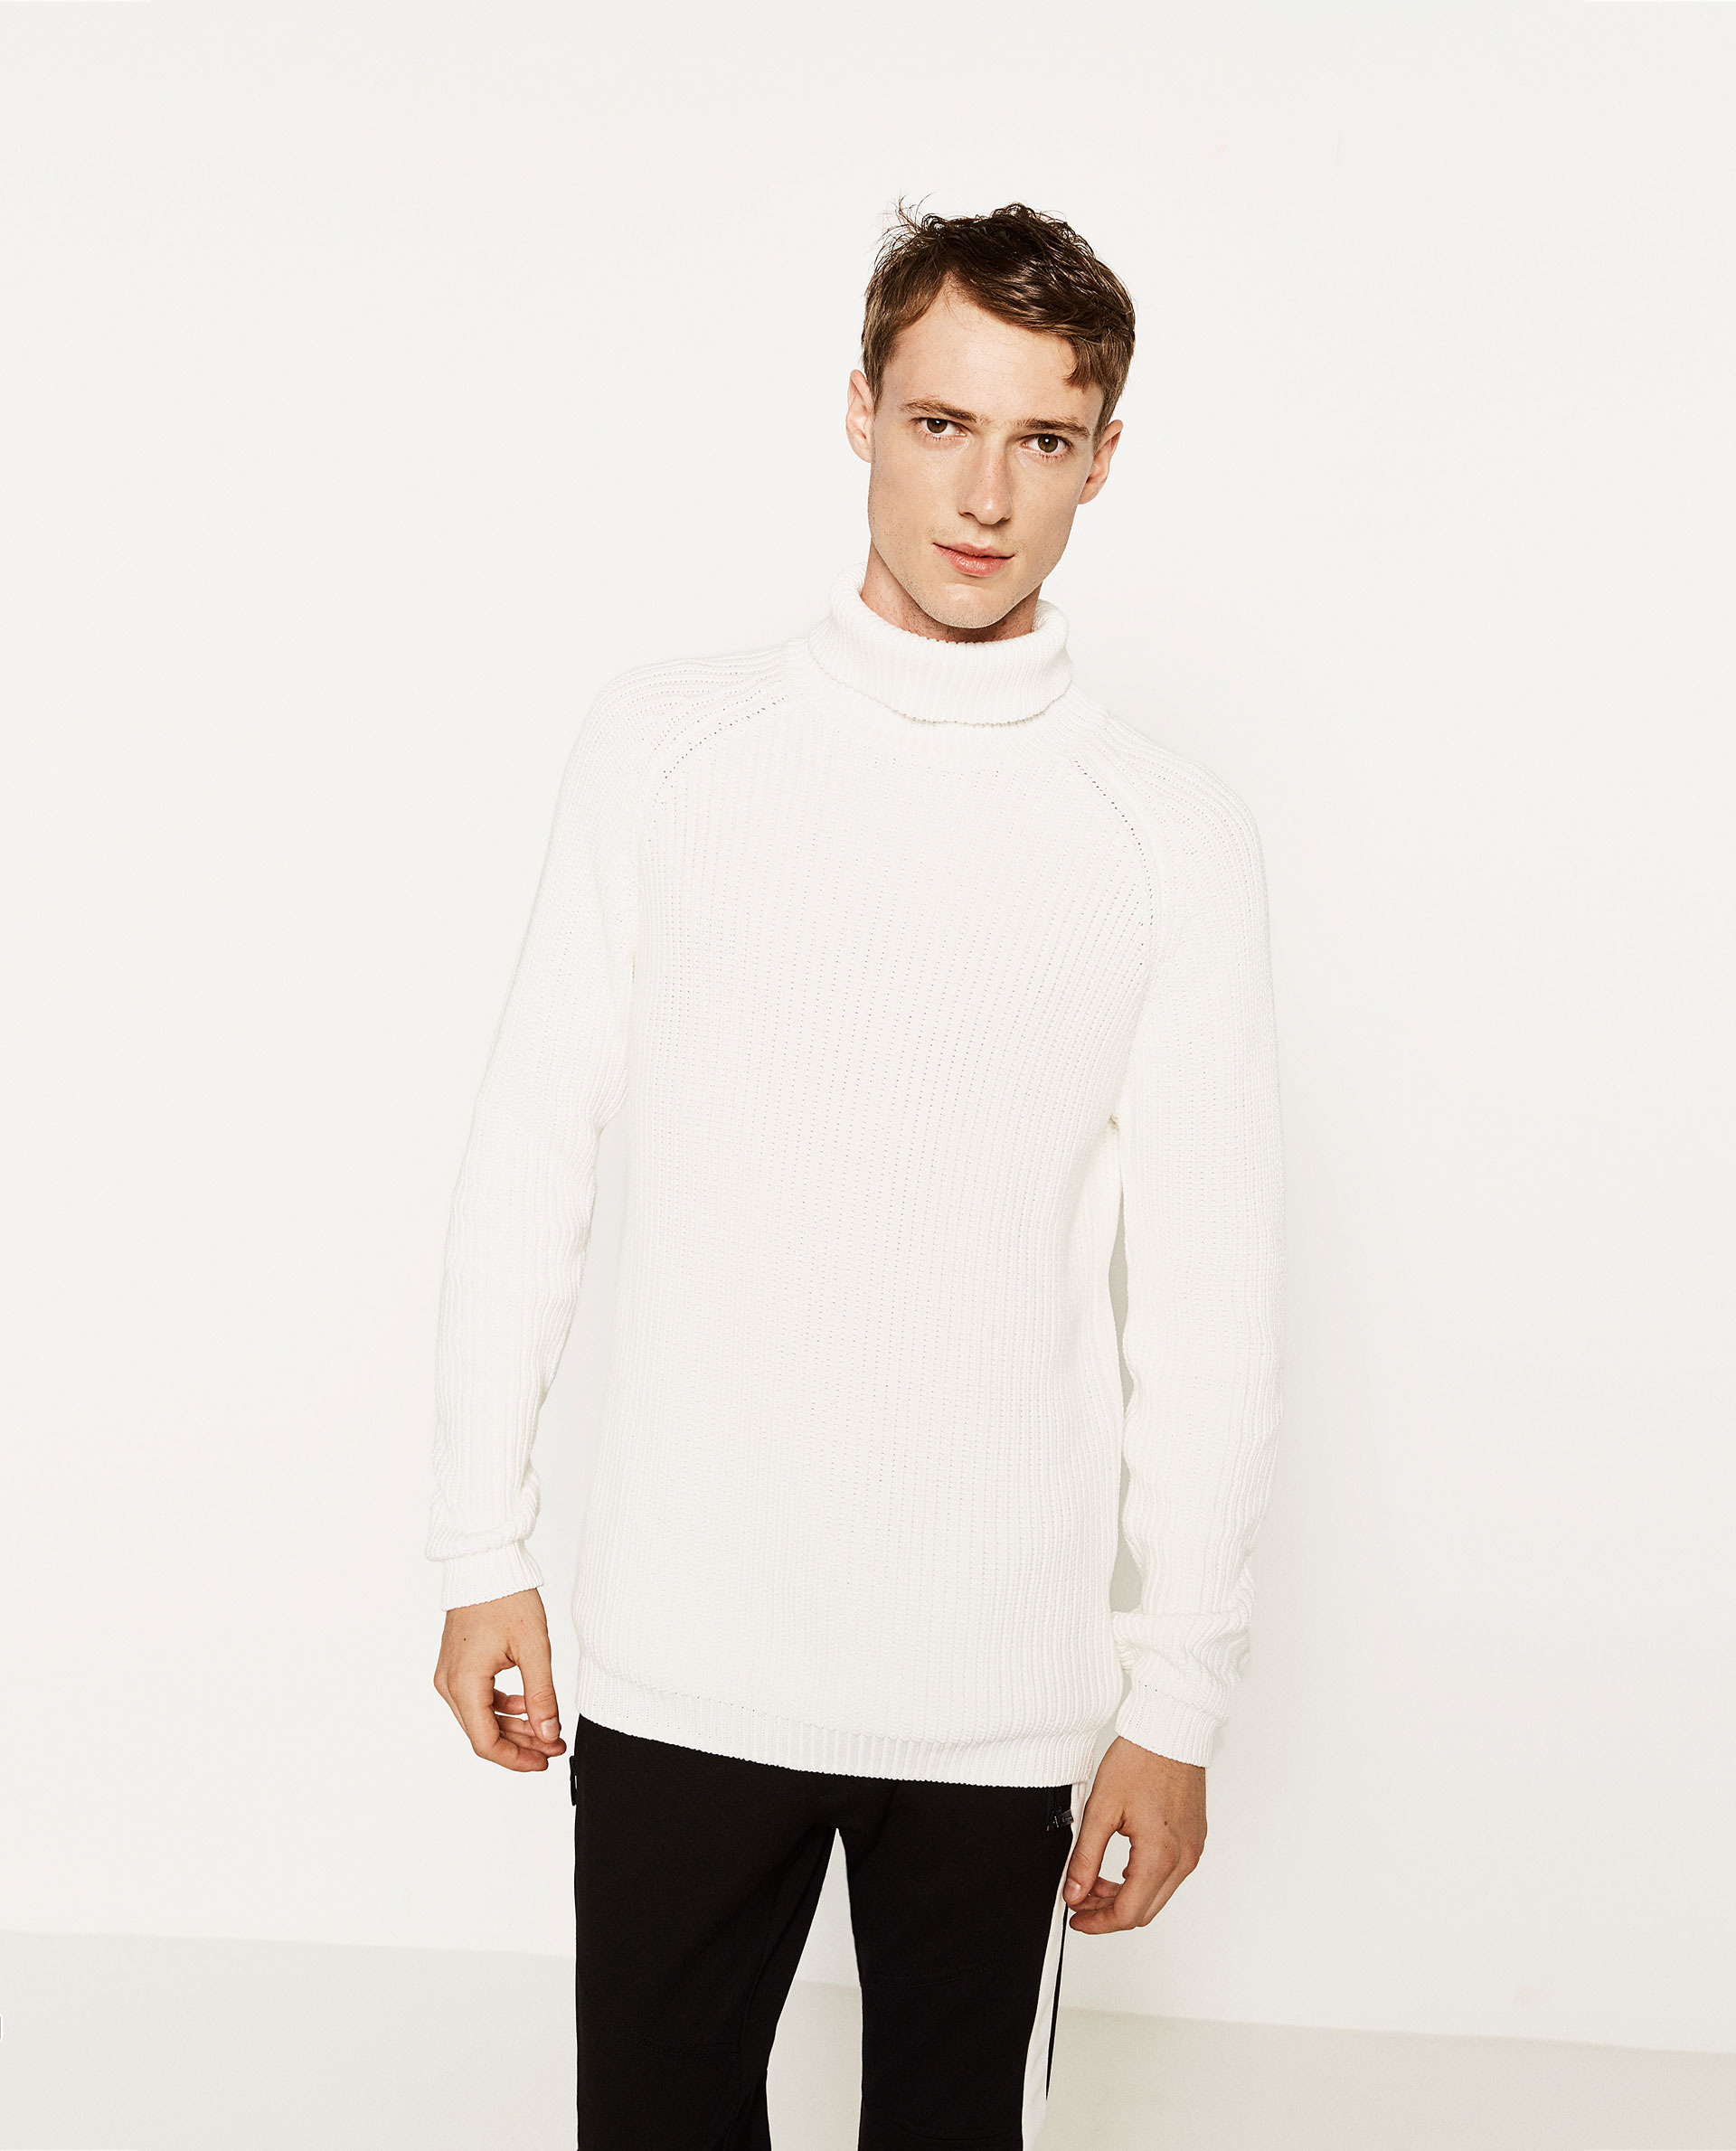 Zara Turtleneck Sweater Mens 93